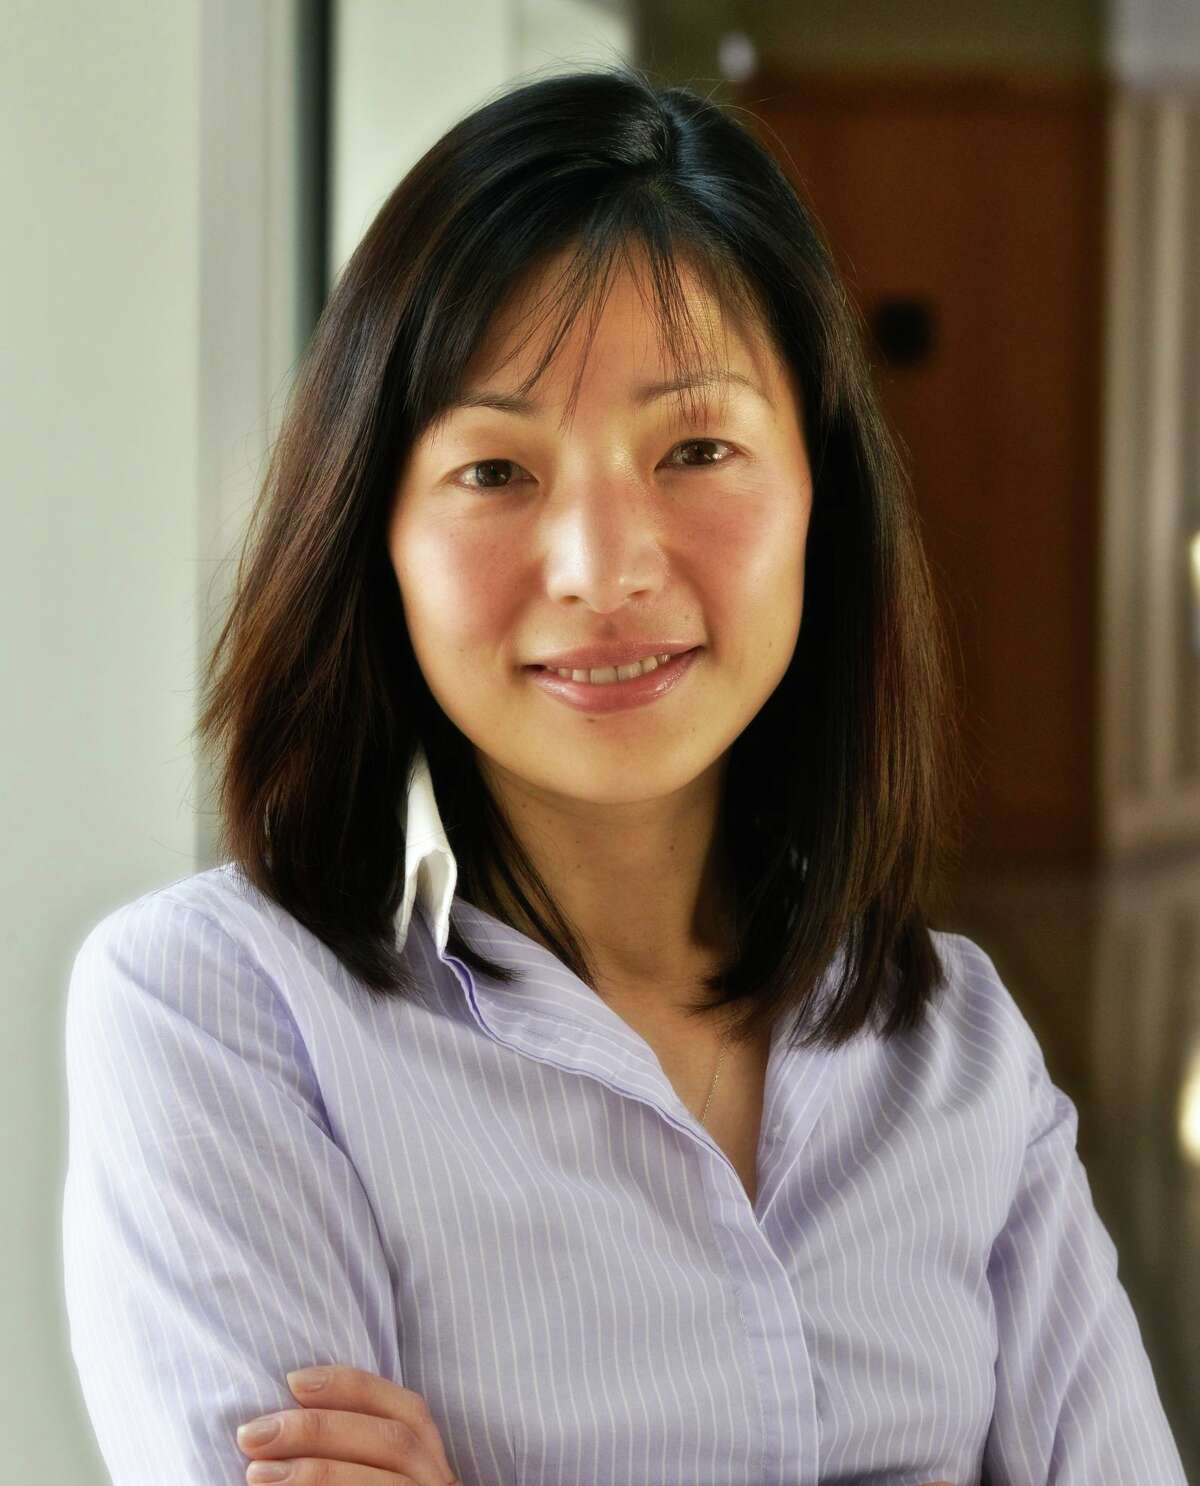 Akiko Iwasaki, professor of immunobiology at the Yale School of Medicine.